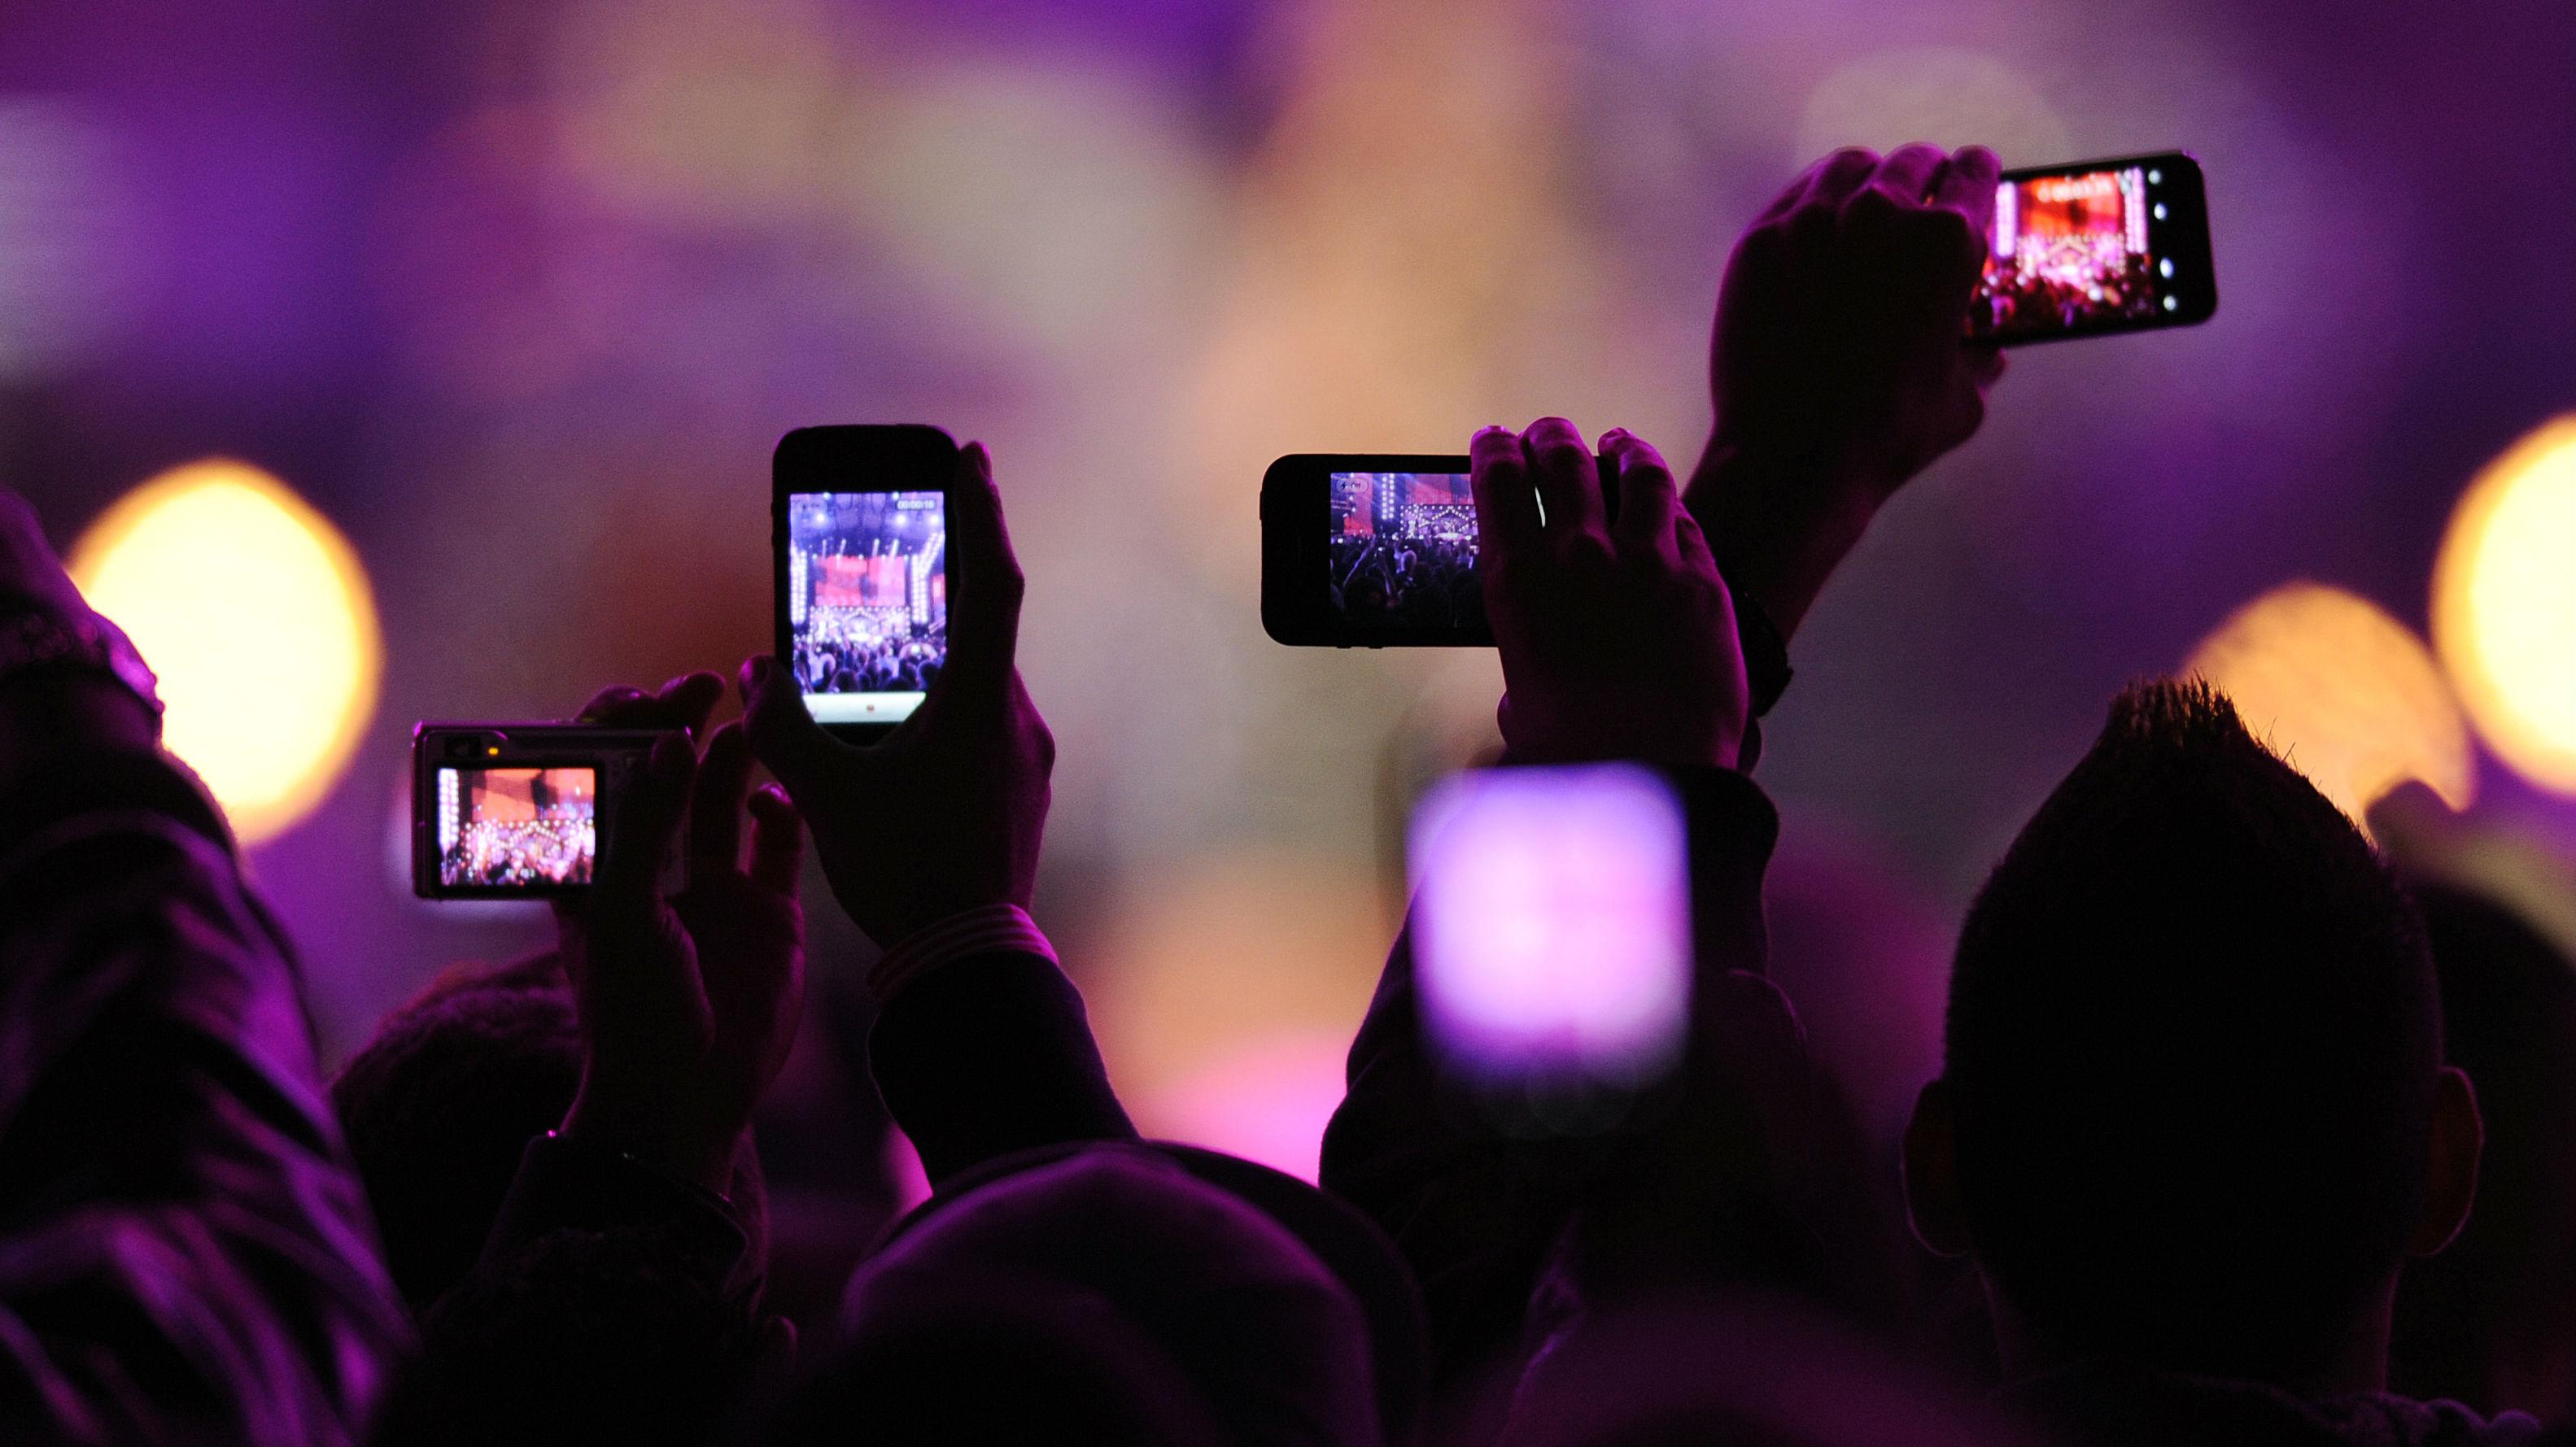 Phones at concert